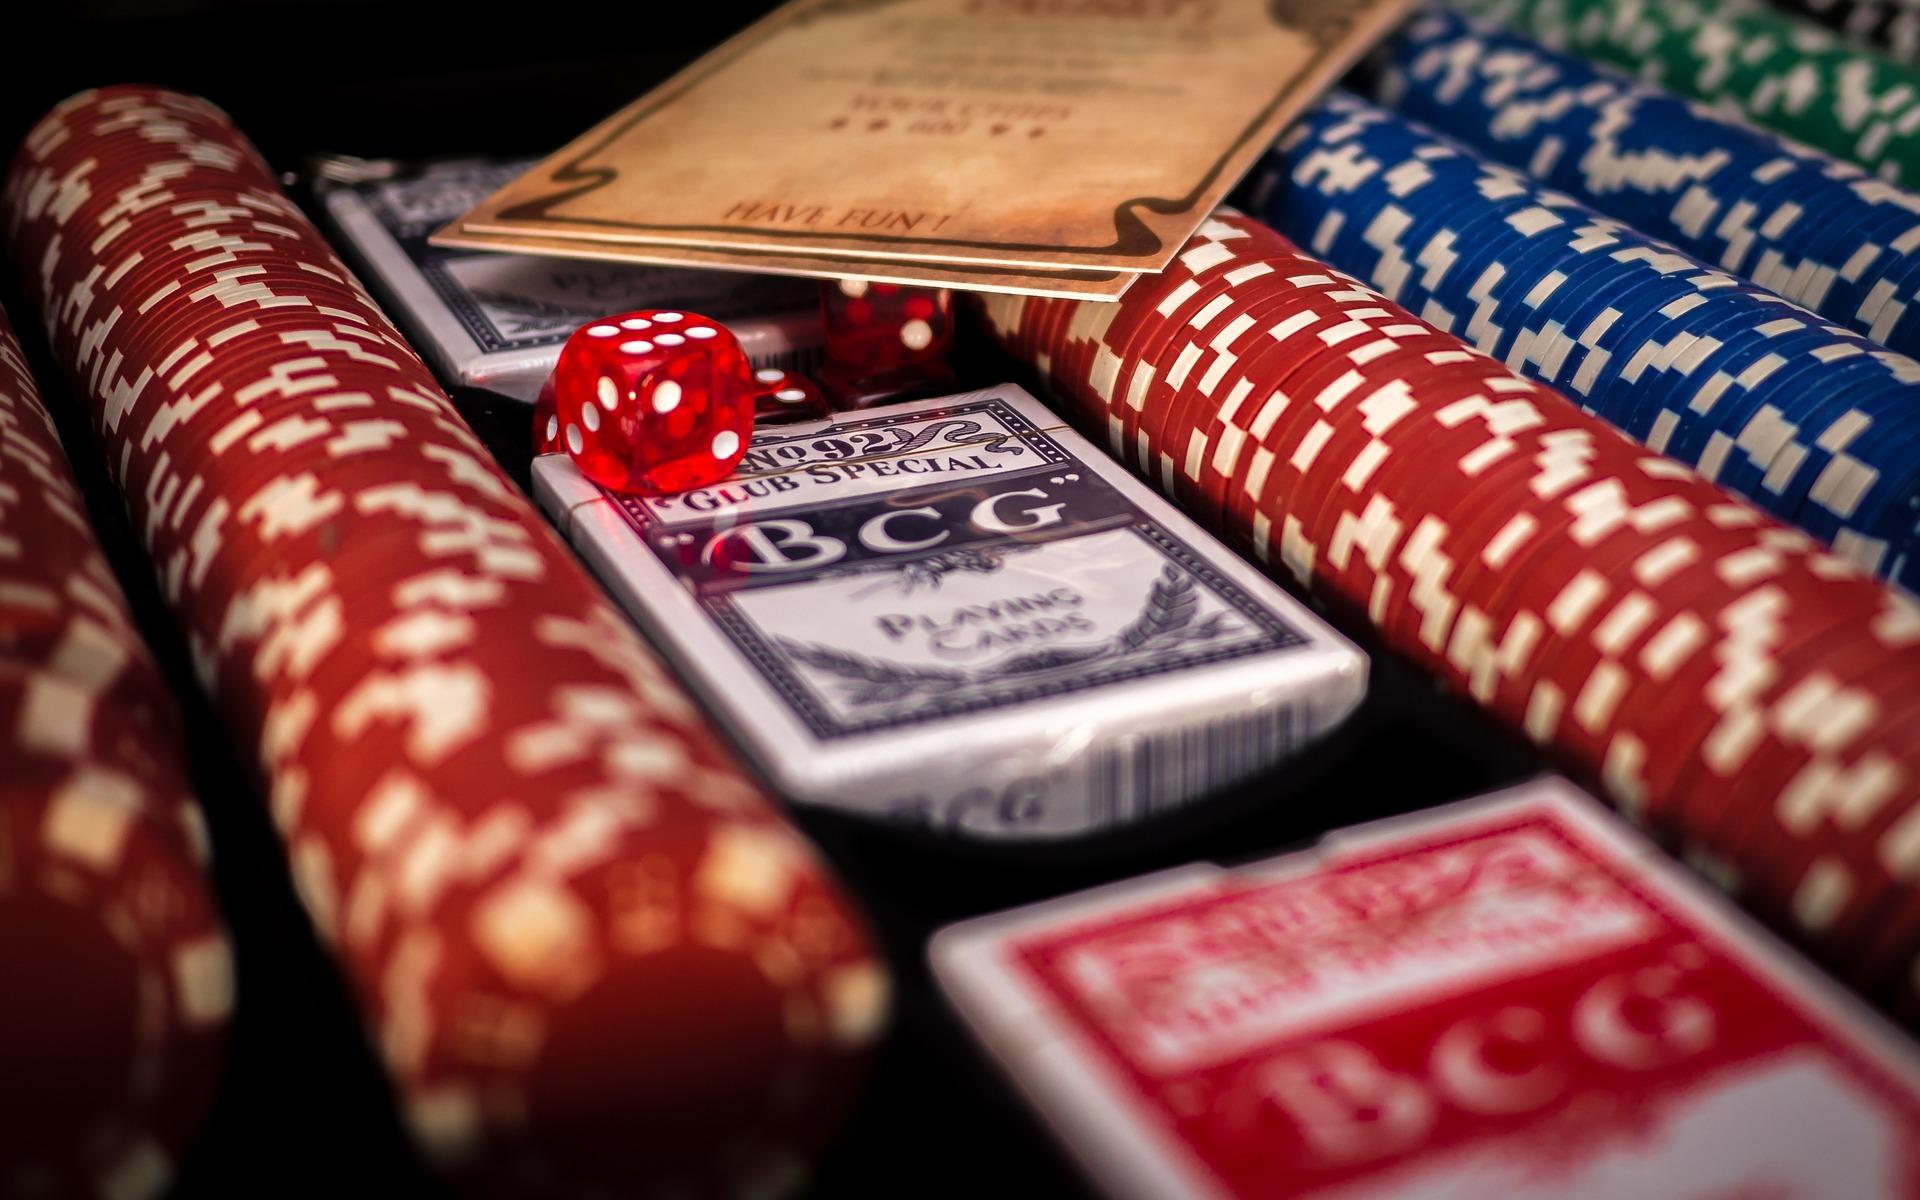 Top Tips for Playing Blackjack